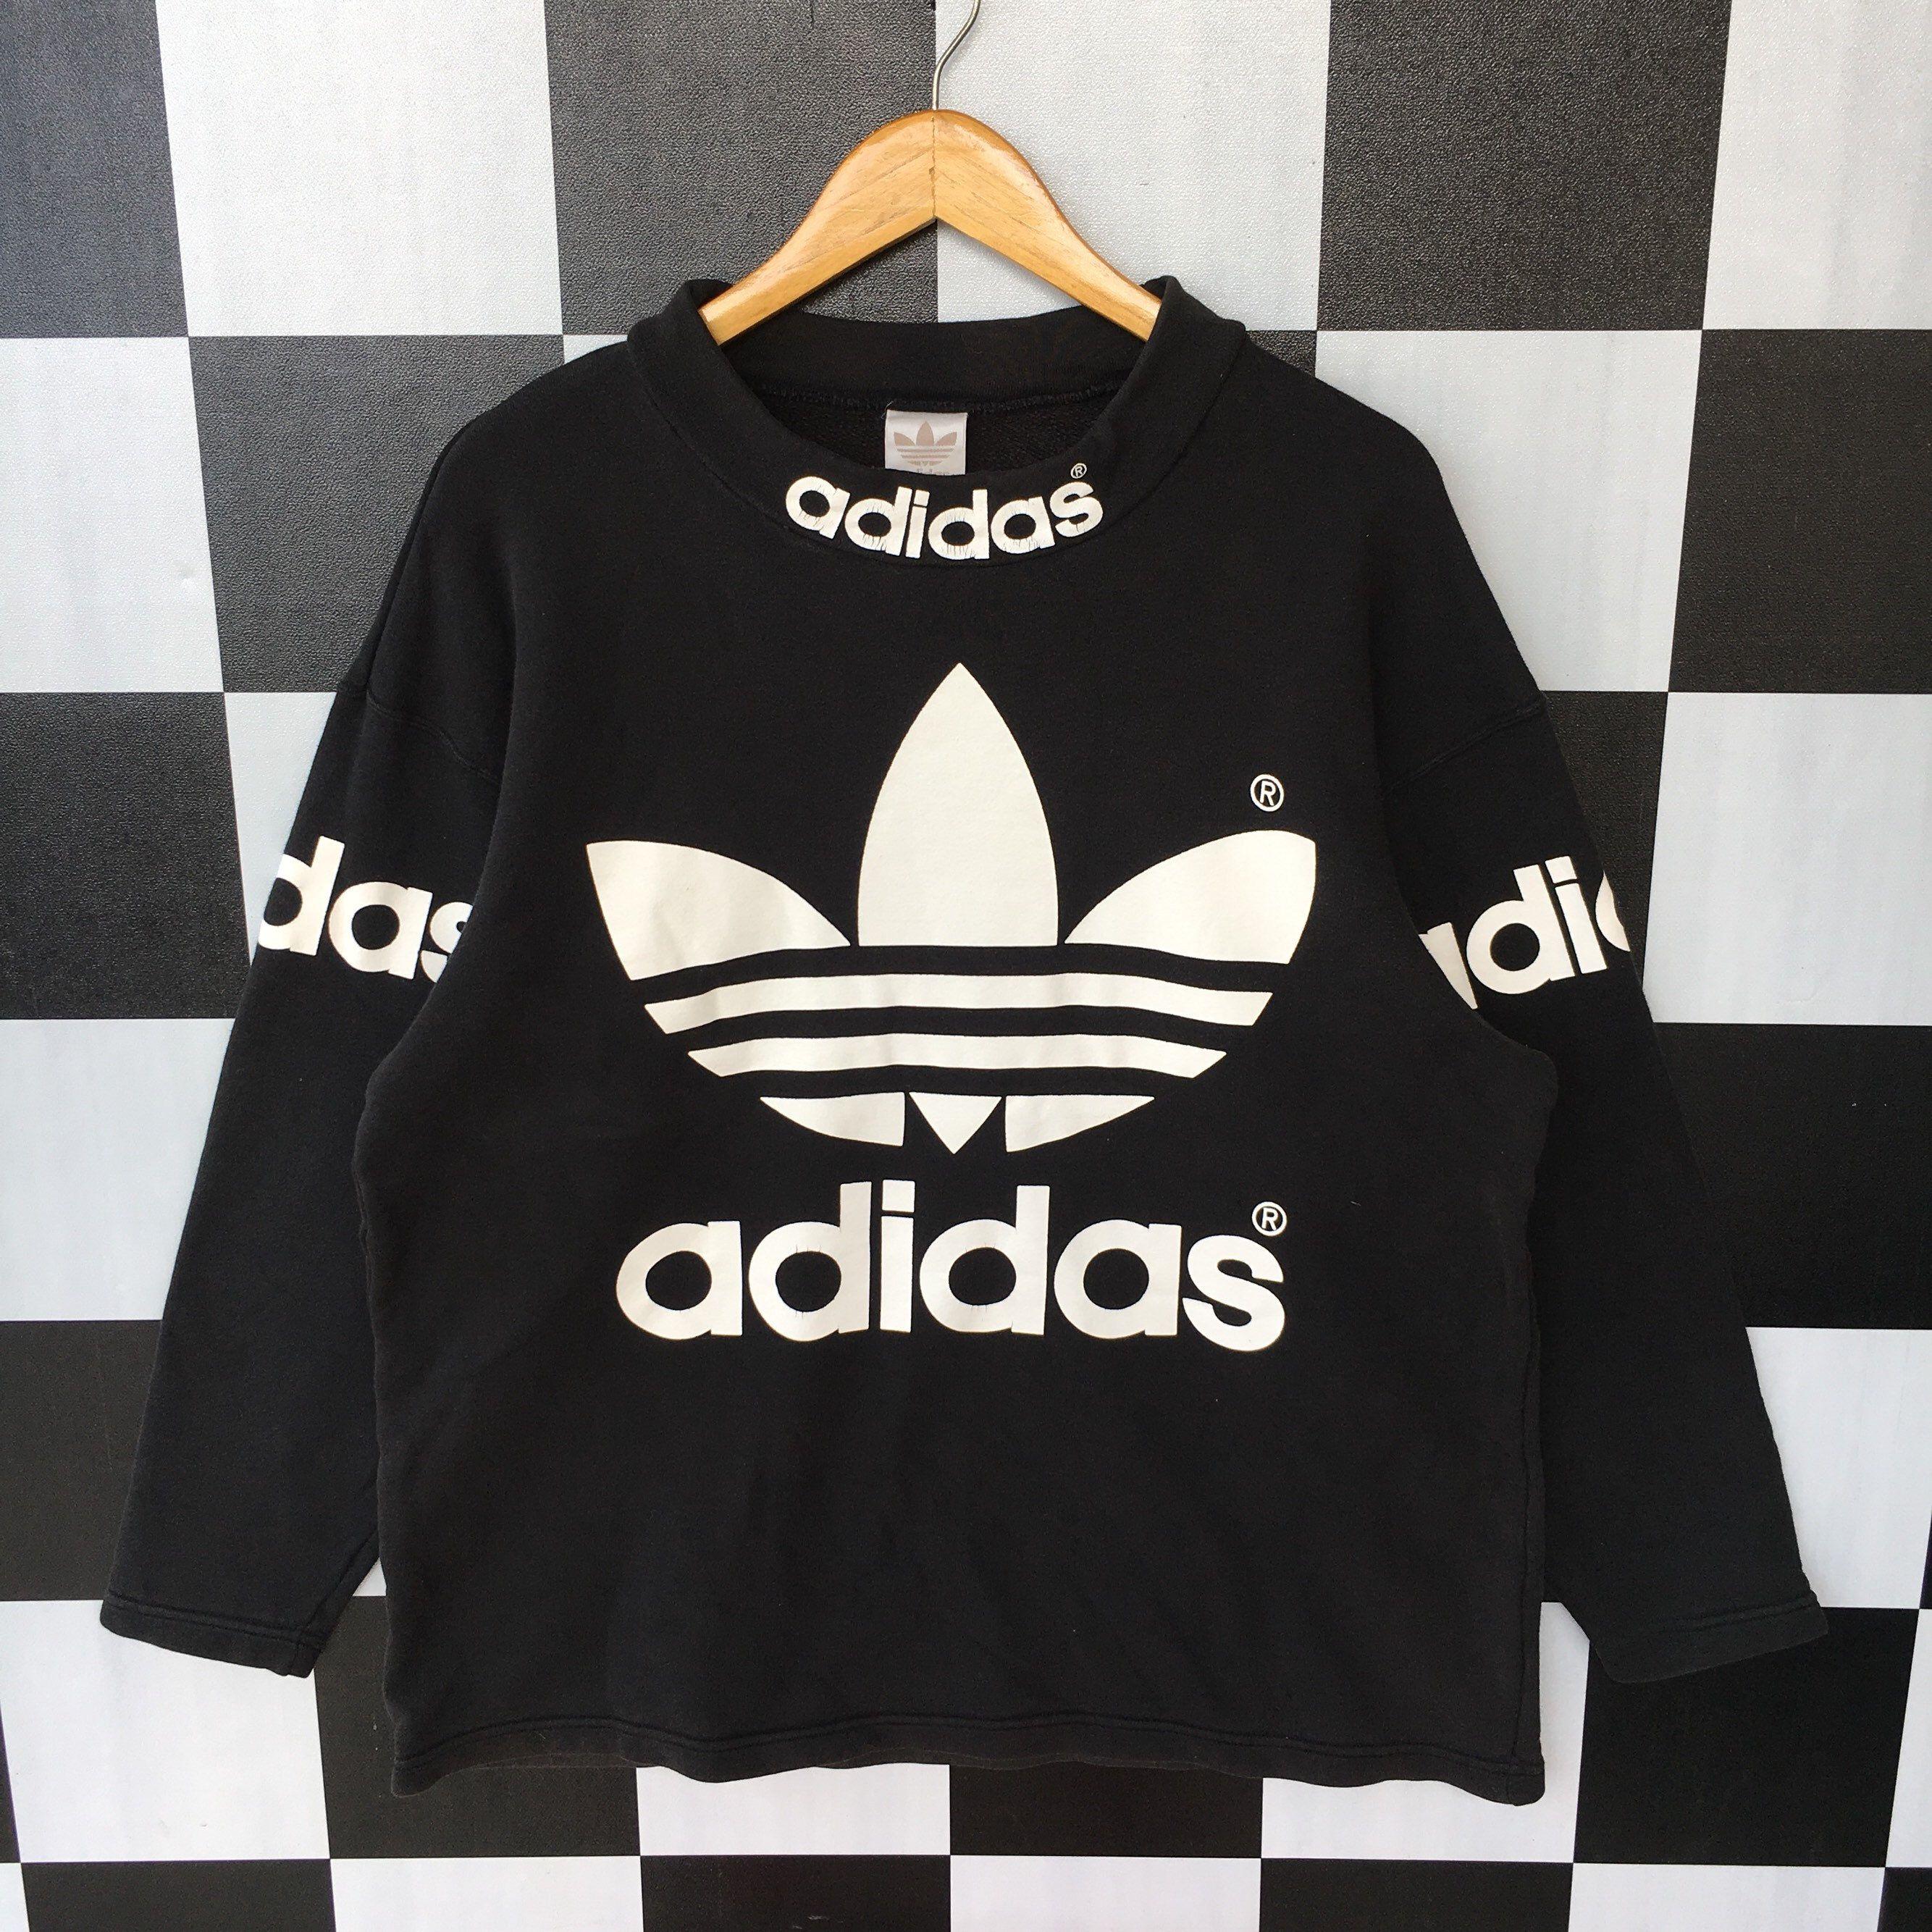 Vintage 90s Adidas Trefoil Sweatshirt Jumper Adidas Three Etsy Adidas Pullover Adidas Three Stripes Sweatshirts [ 2668 x 2668 Pixel ]